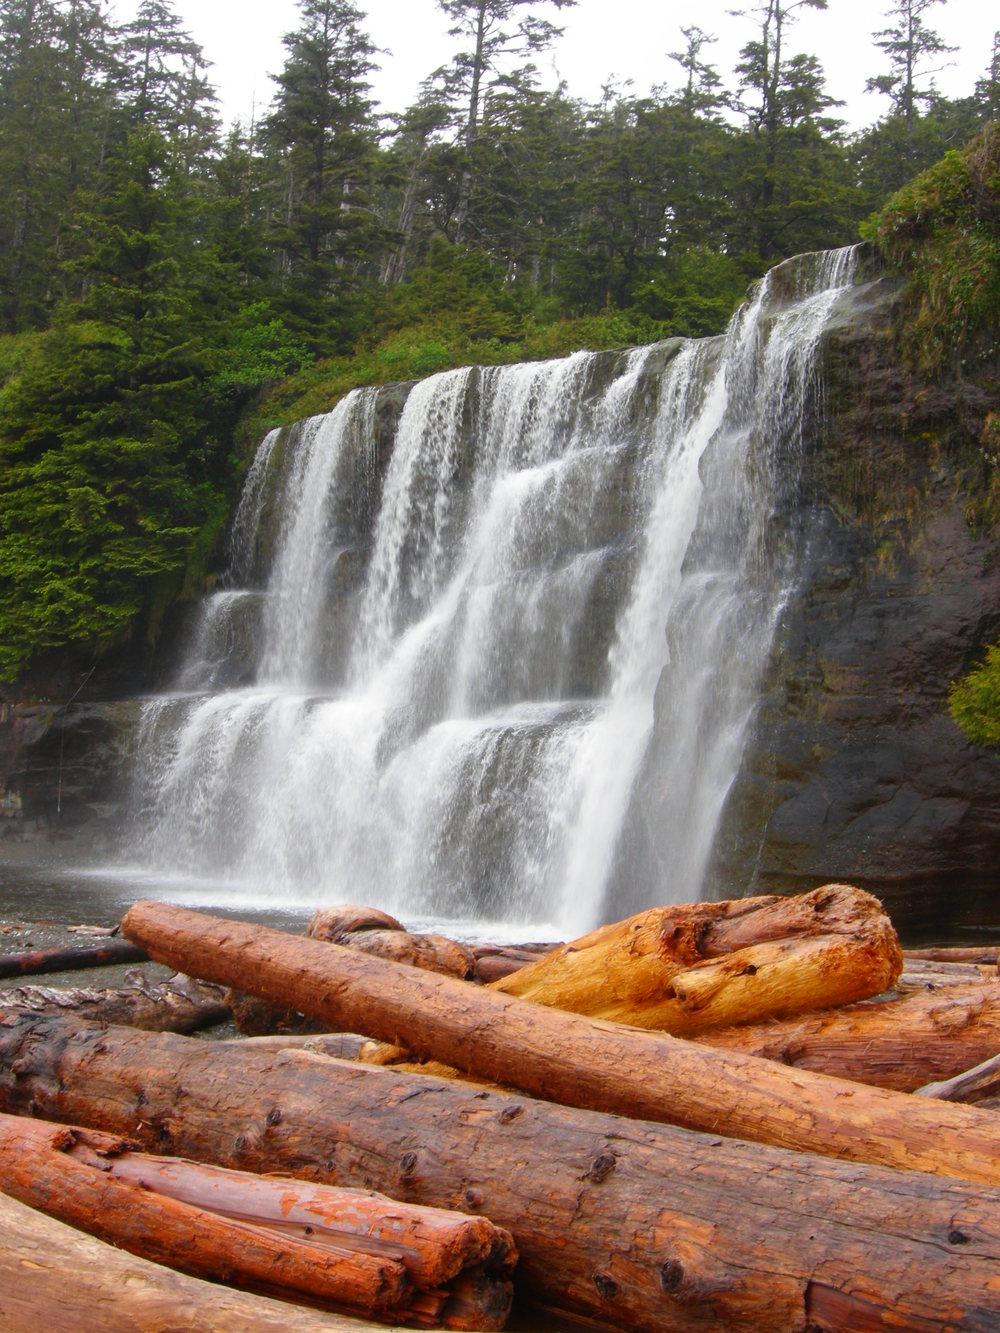 West Coast Trail (Canada) | June 2008